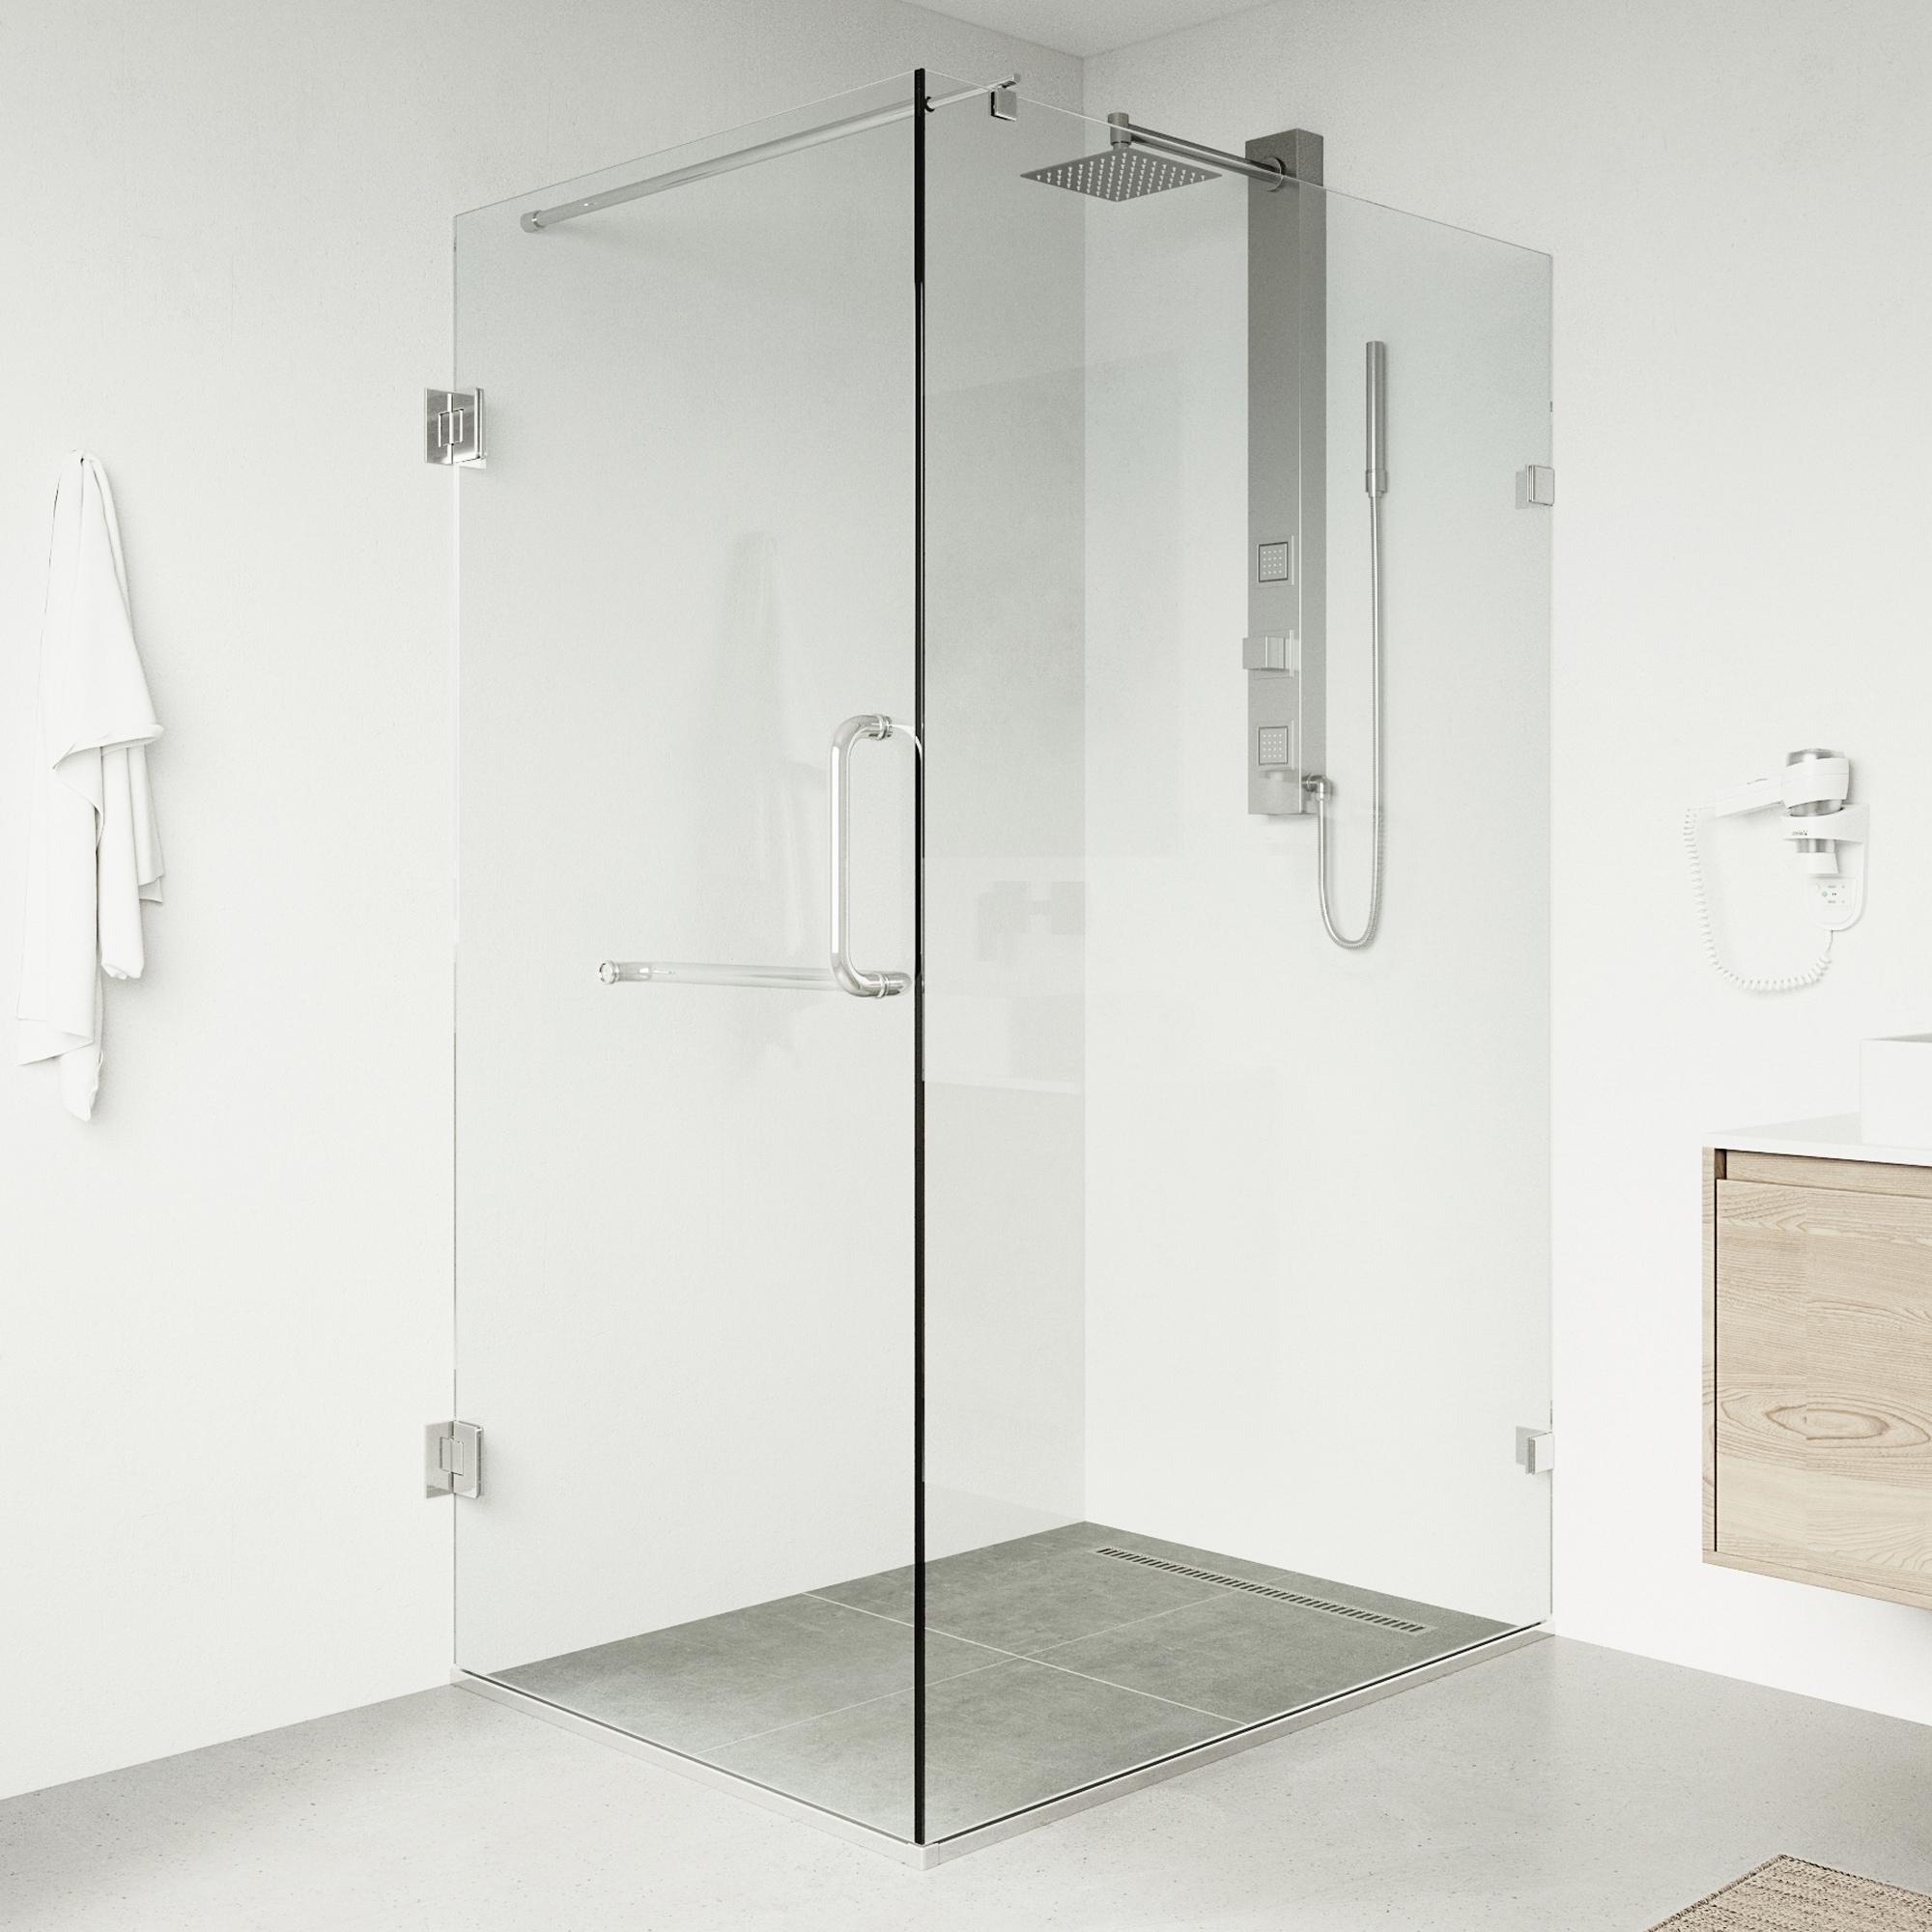 Vigo Frameless Clear Shower Enclosure 36 X 48 Overstock 4804053 Brush Nickel